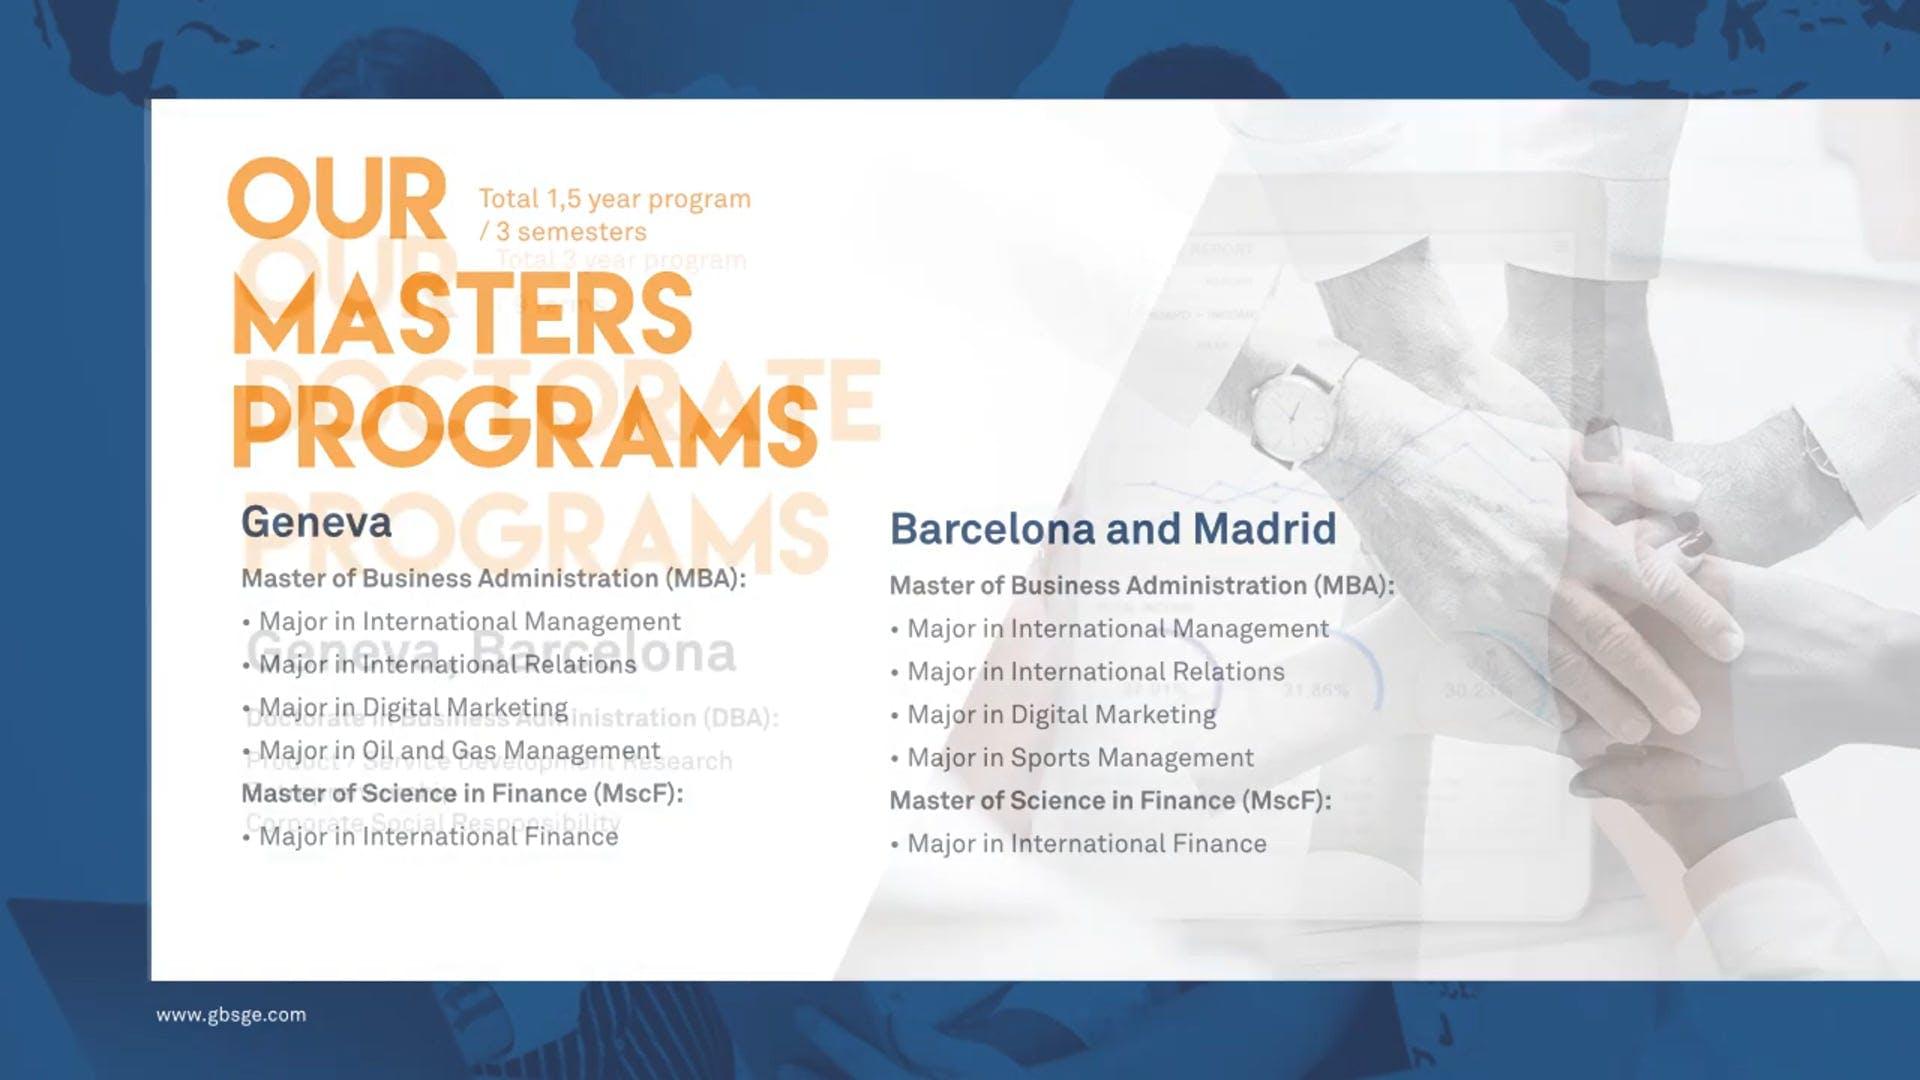 Madrid Campus - Geneva Business School - Madrid - Spain